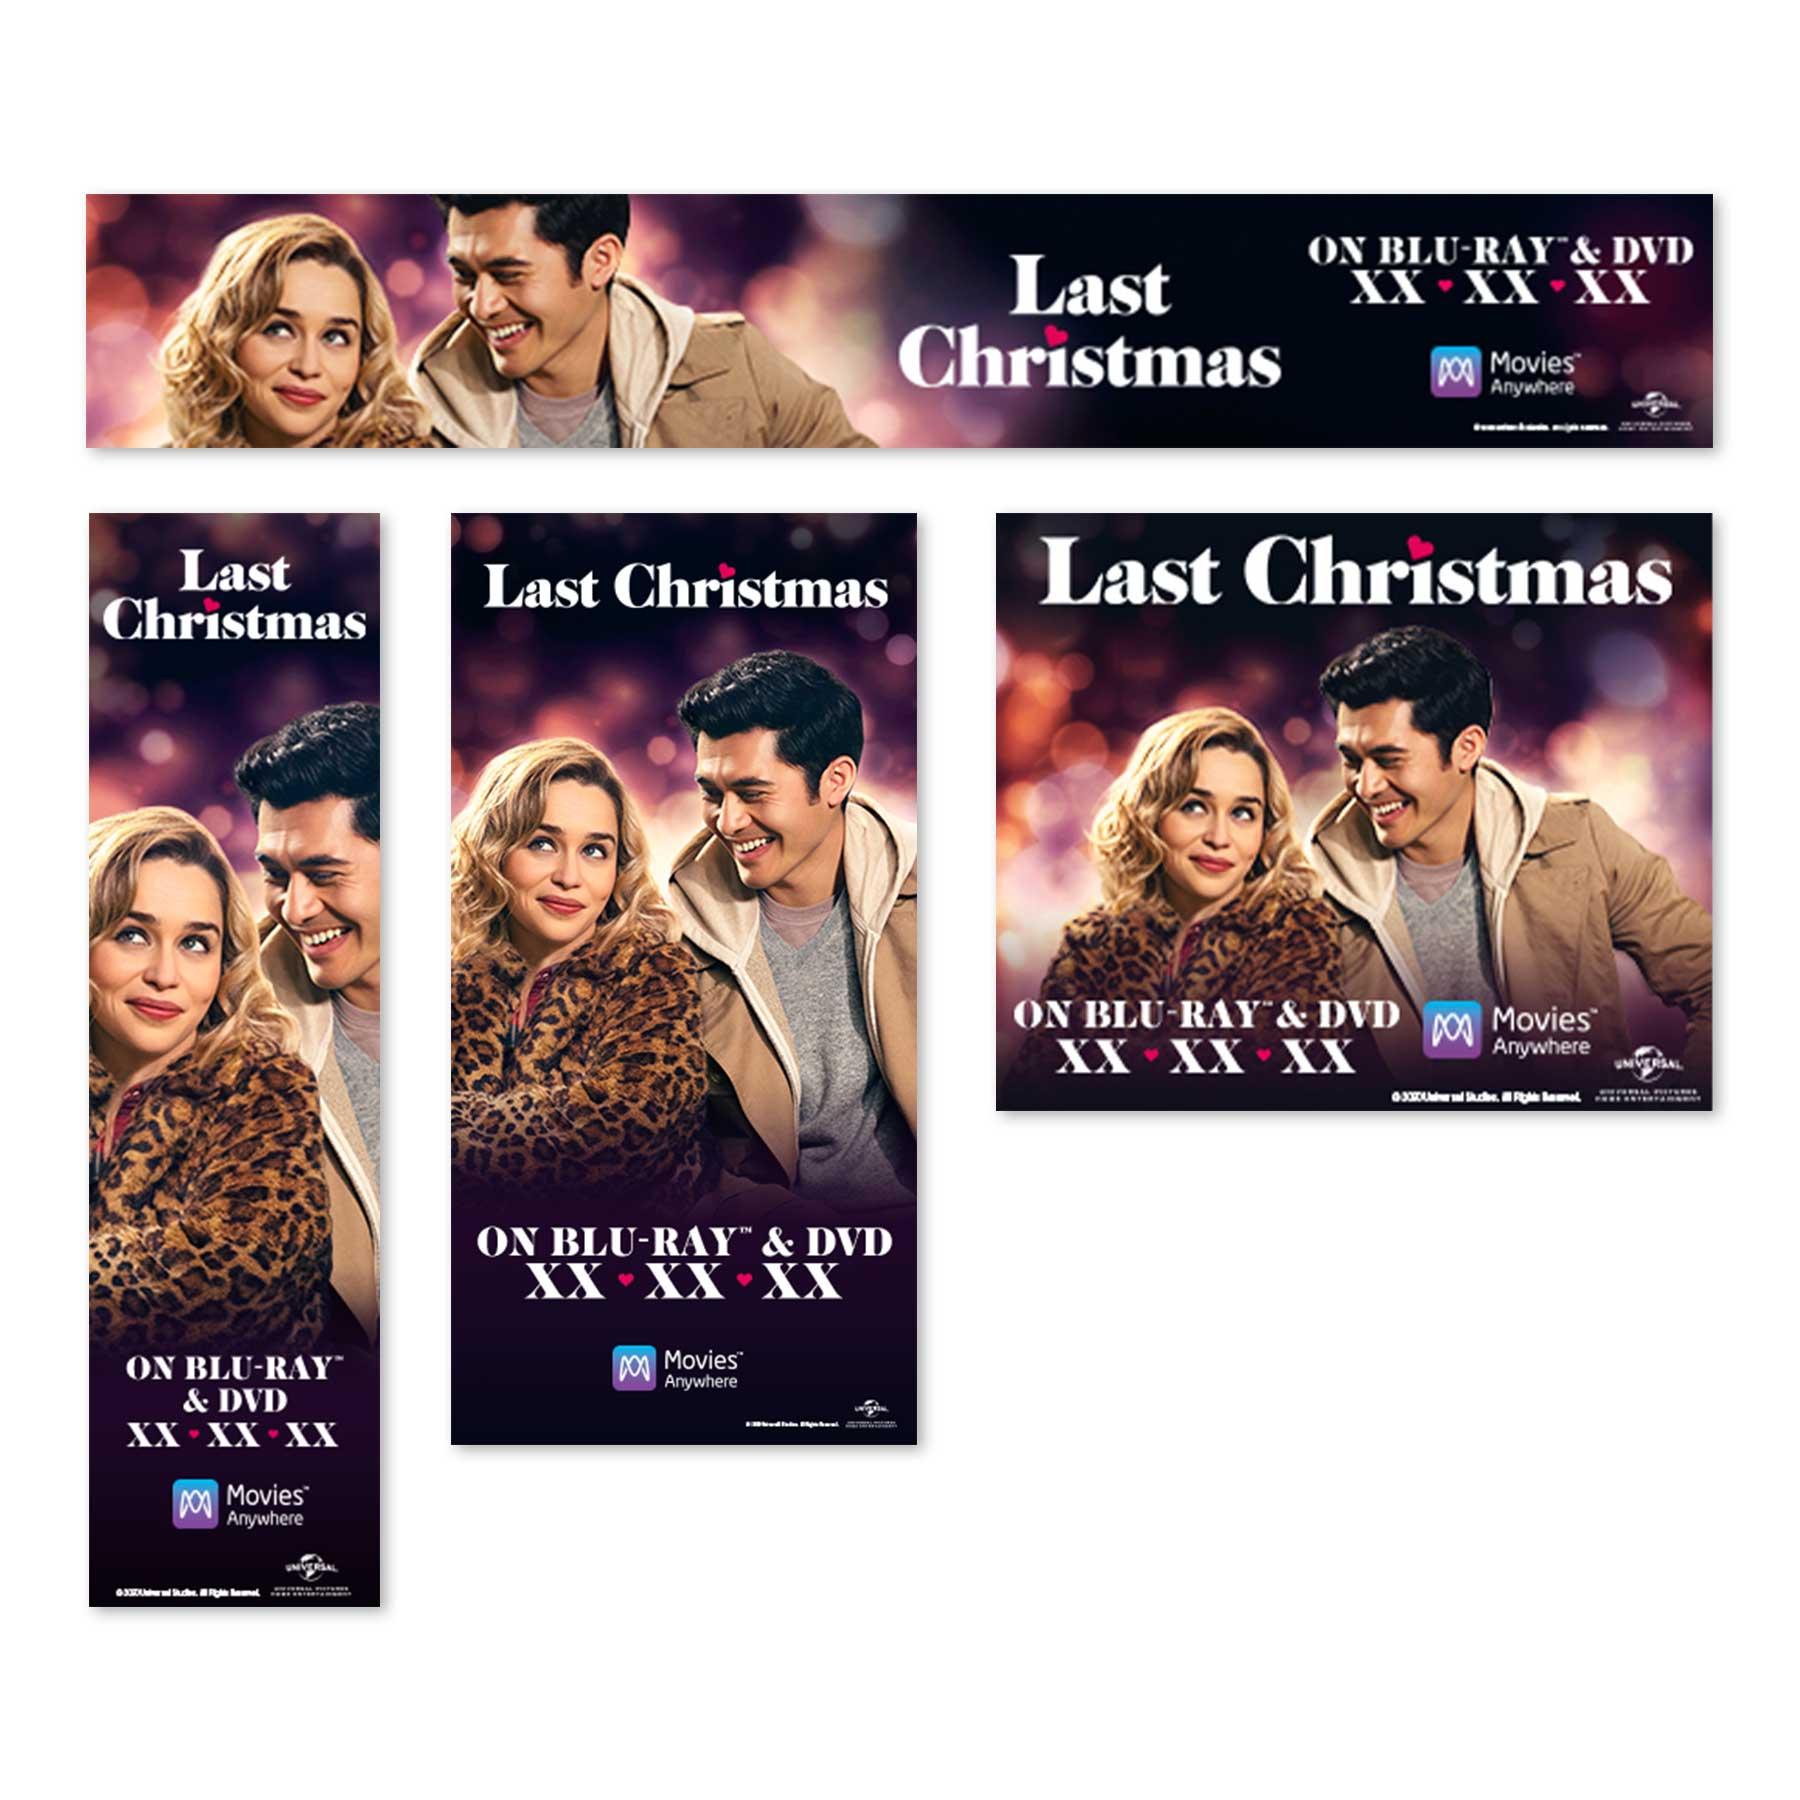 Last Christmas Digital Banners